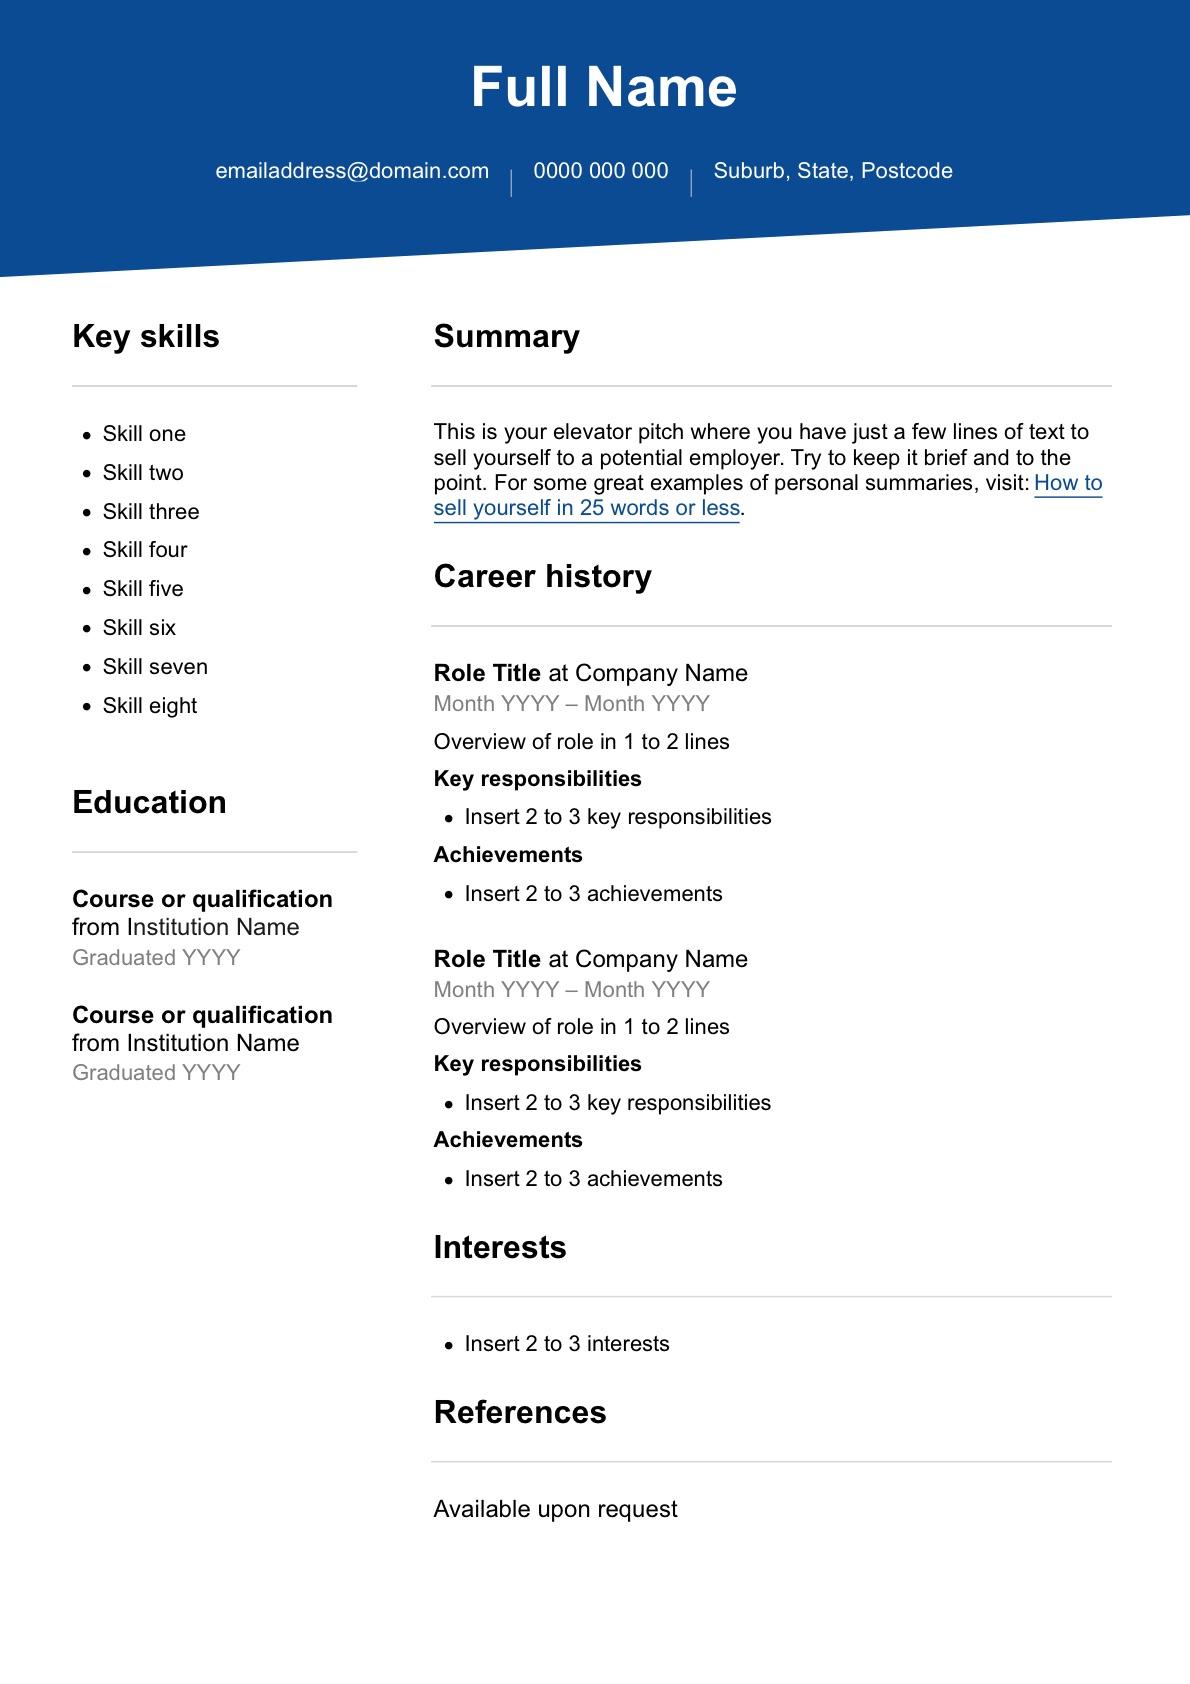 Free Resume Template Seek Career Advice